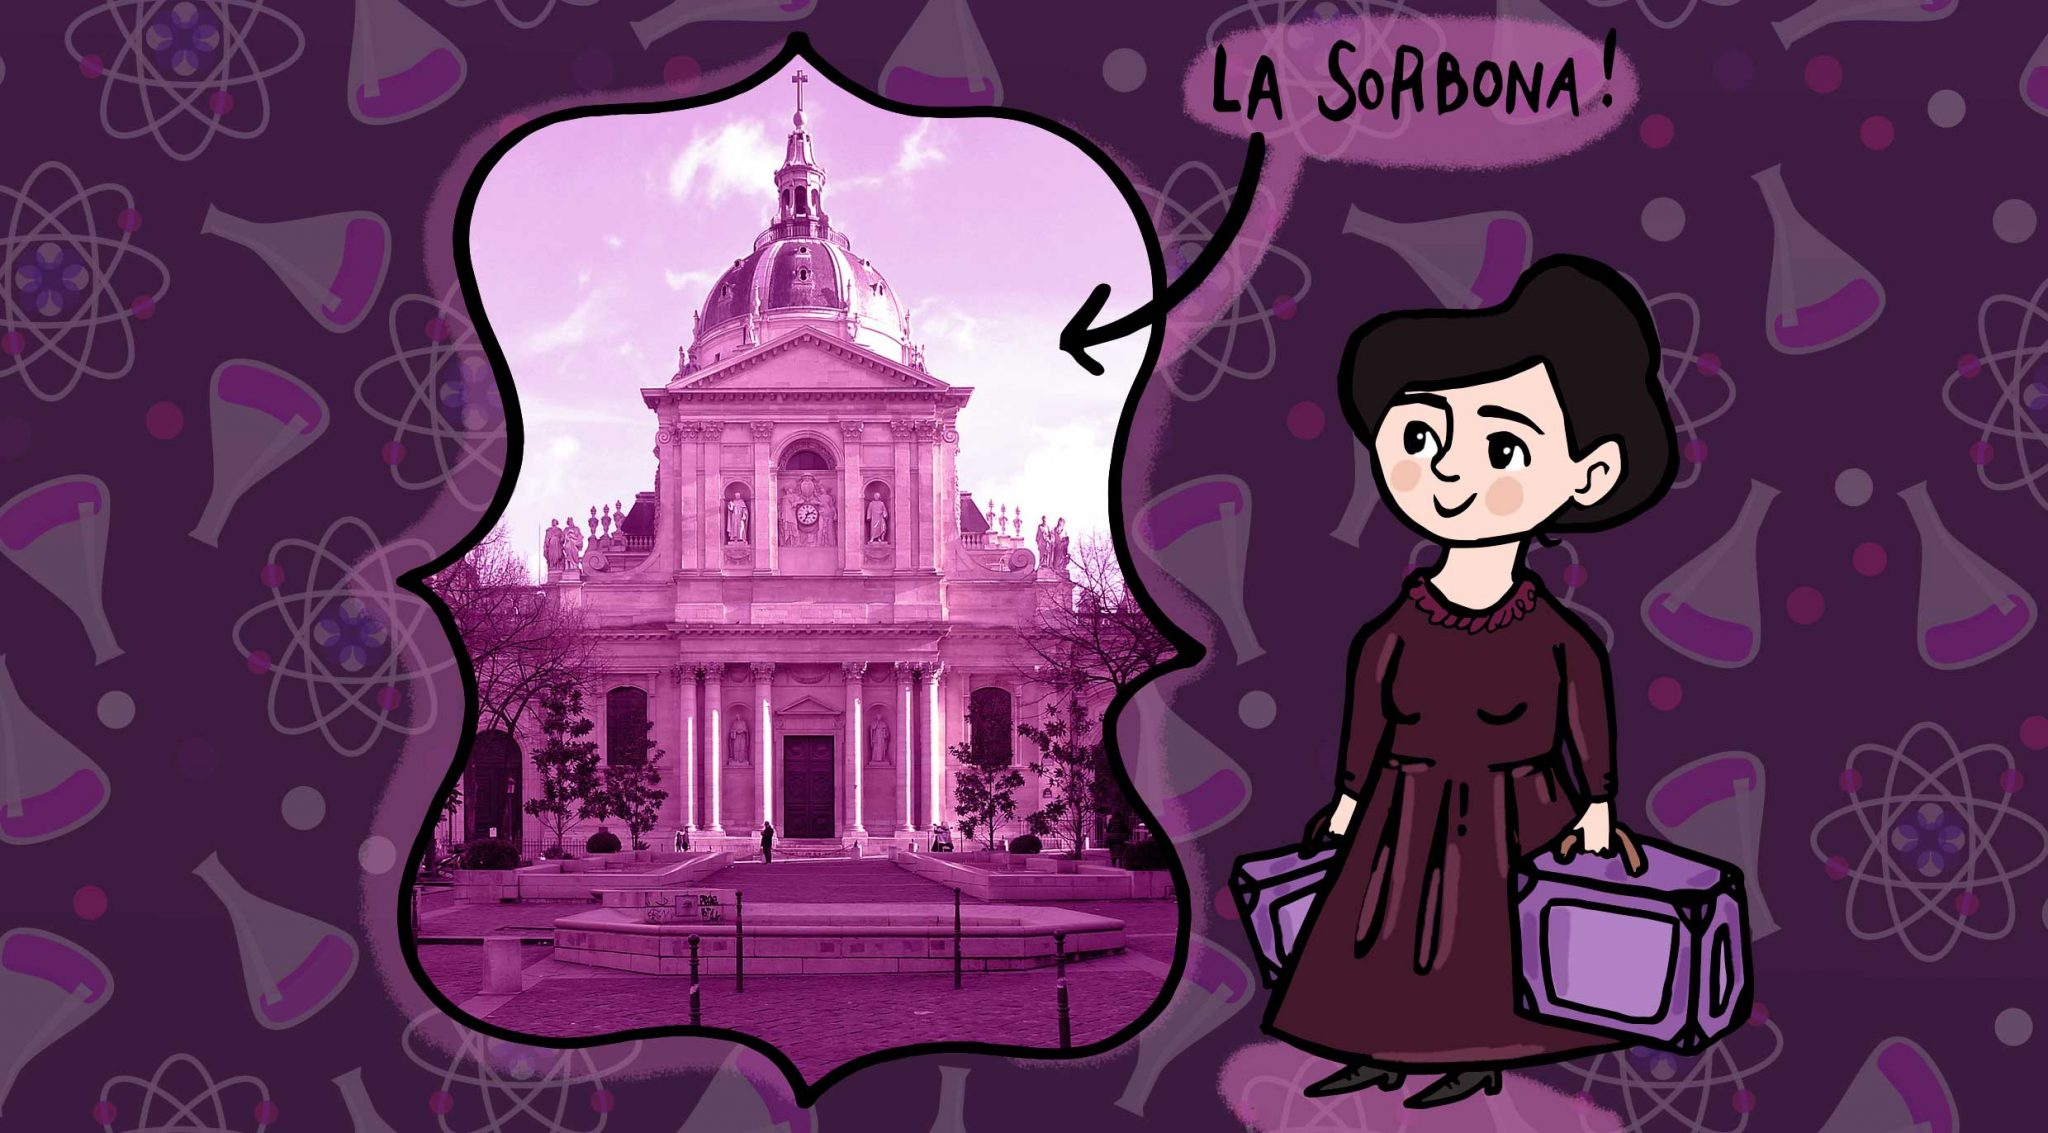 Finalmente-Parigi-Marie-Curie